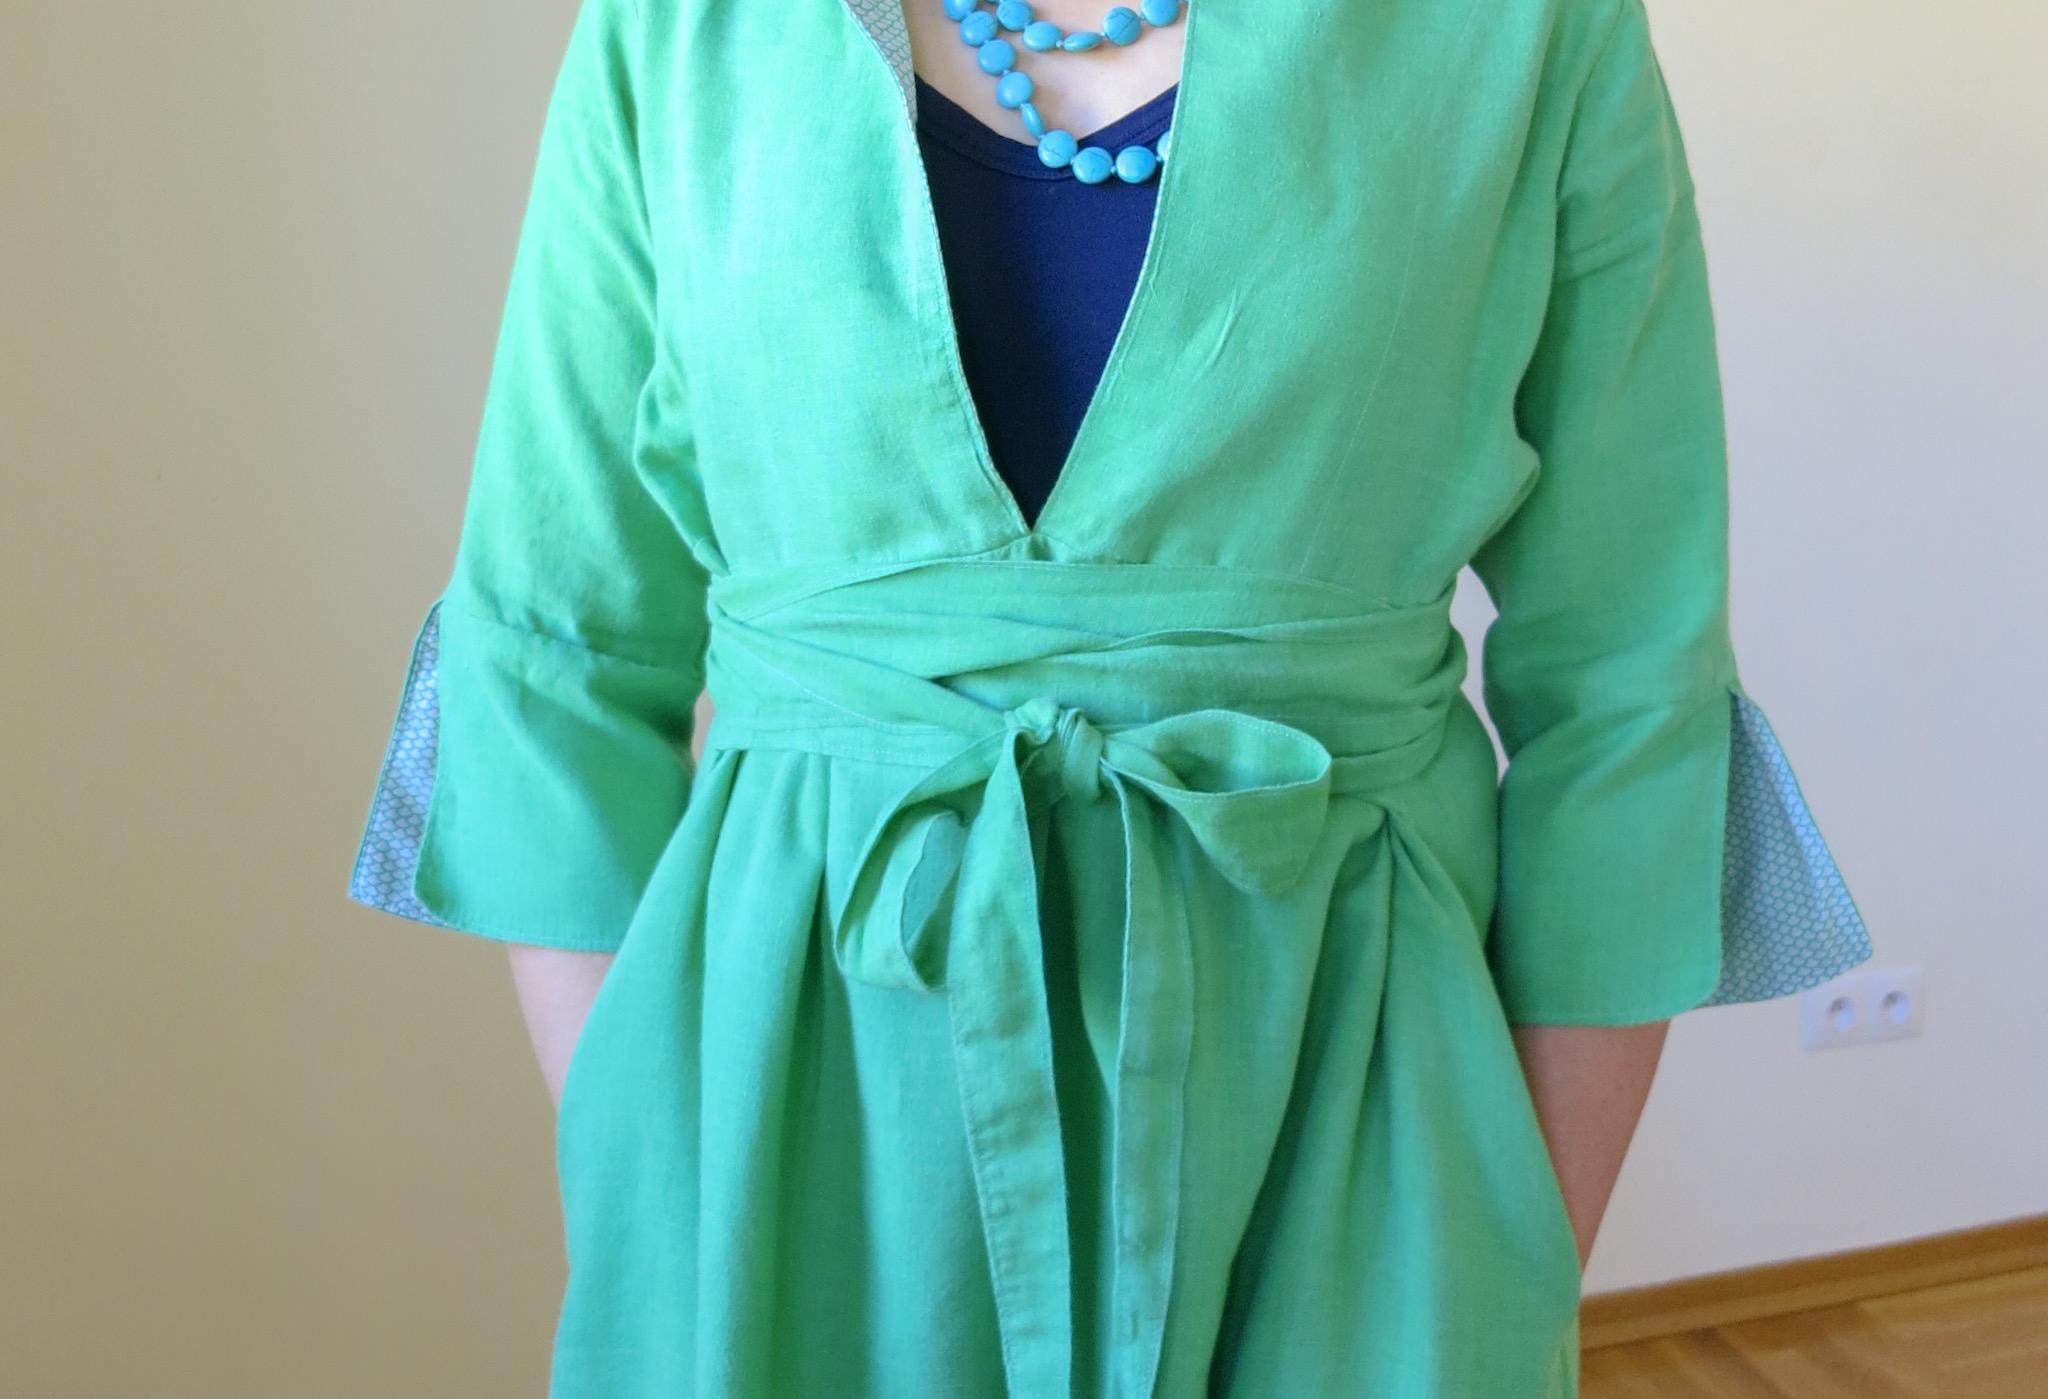 Tie detail on a green linen Schoolhouse Tunic dress